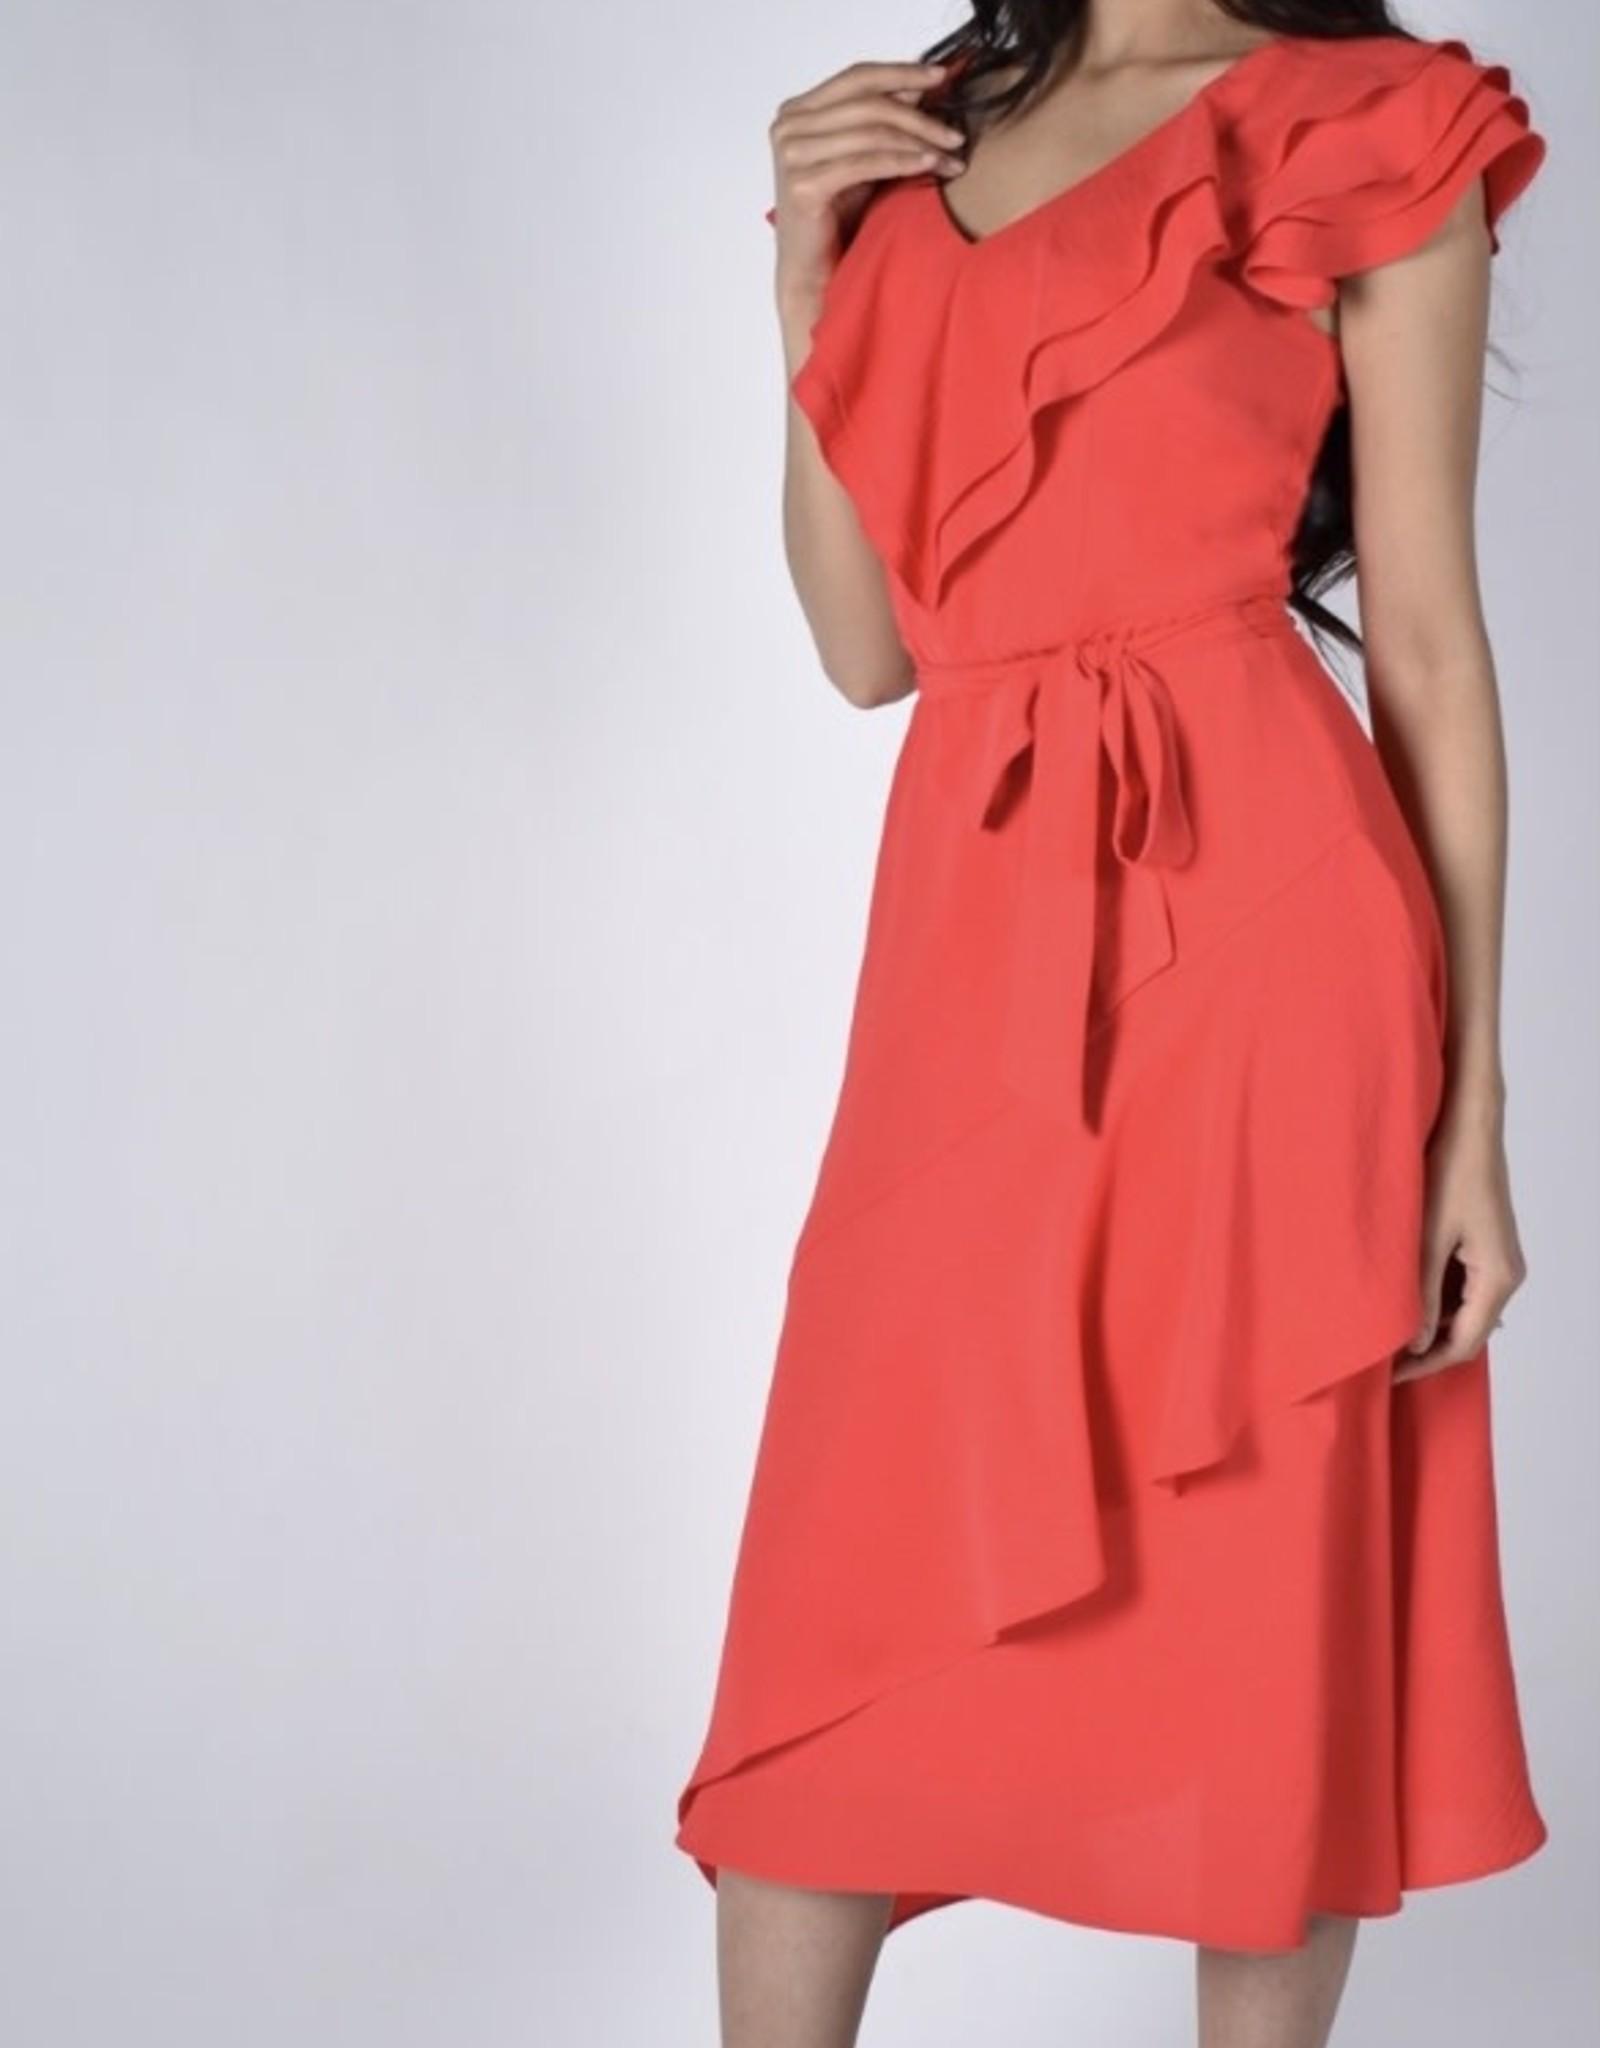 Frank Lyman Coral Frill Dress